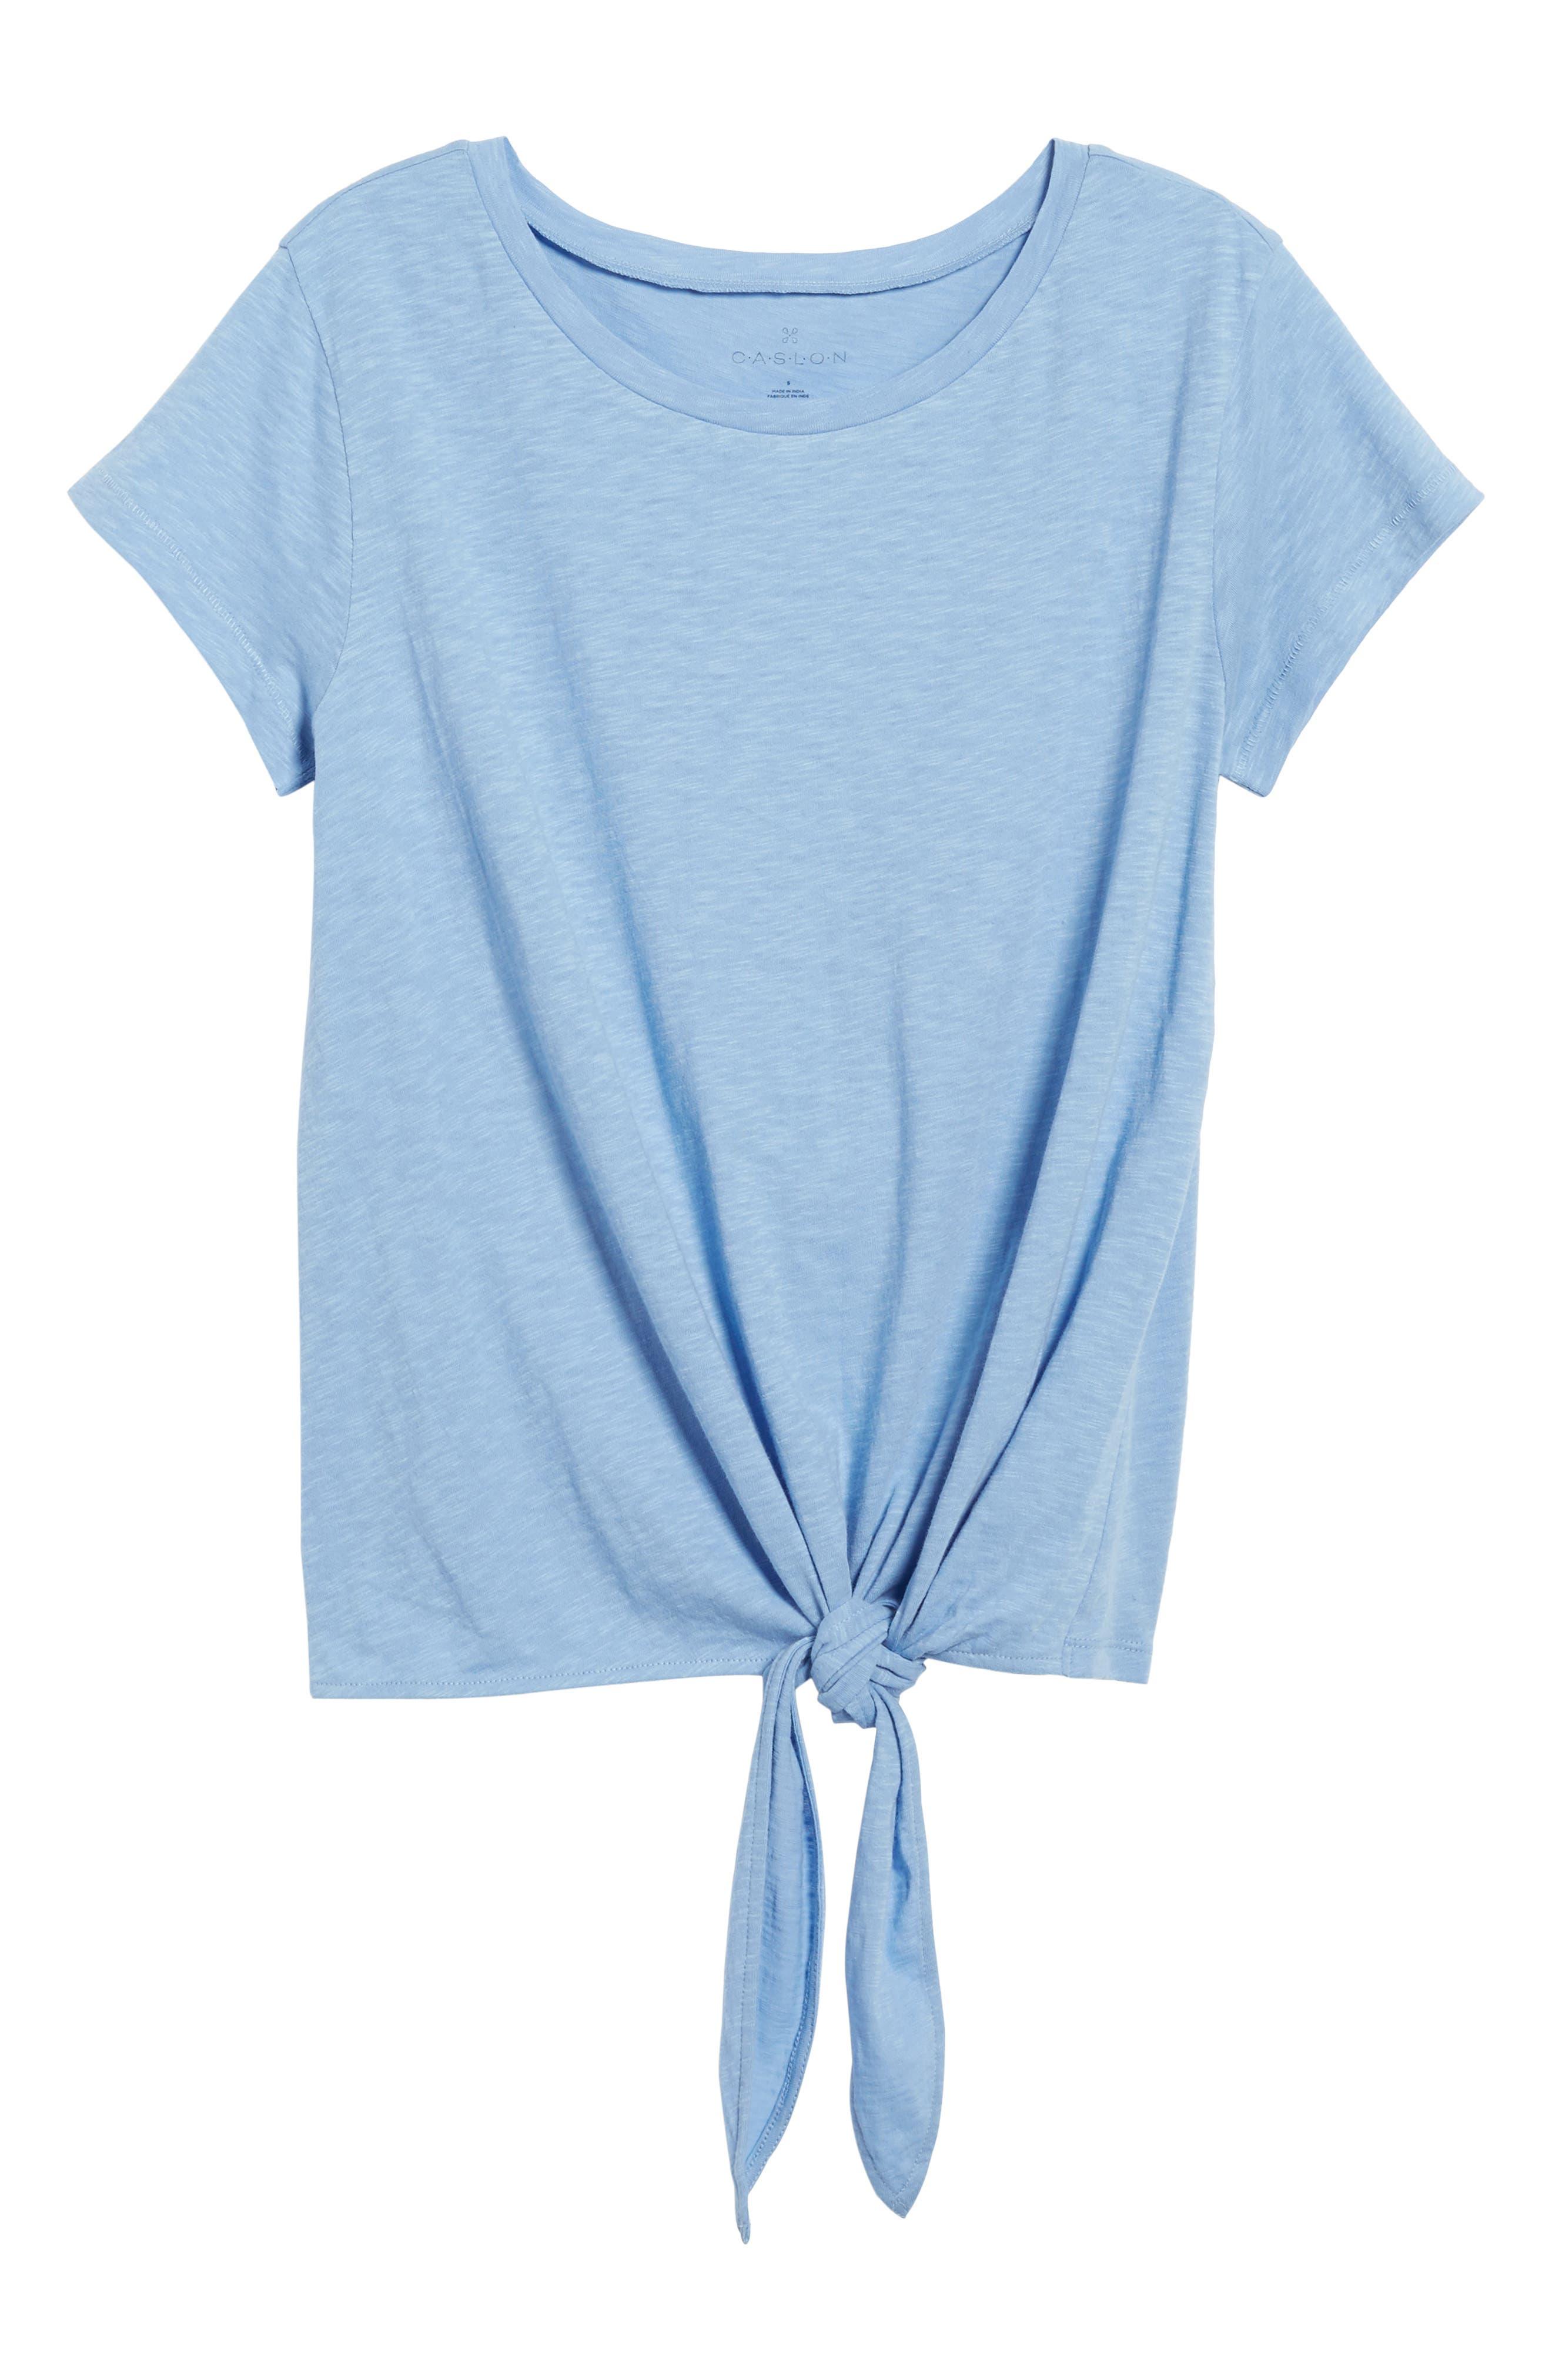 Tie Front Tee,                             Alternate thumbnail 7, color,                             Blue Bel Air